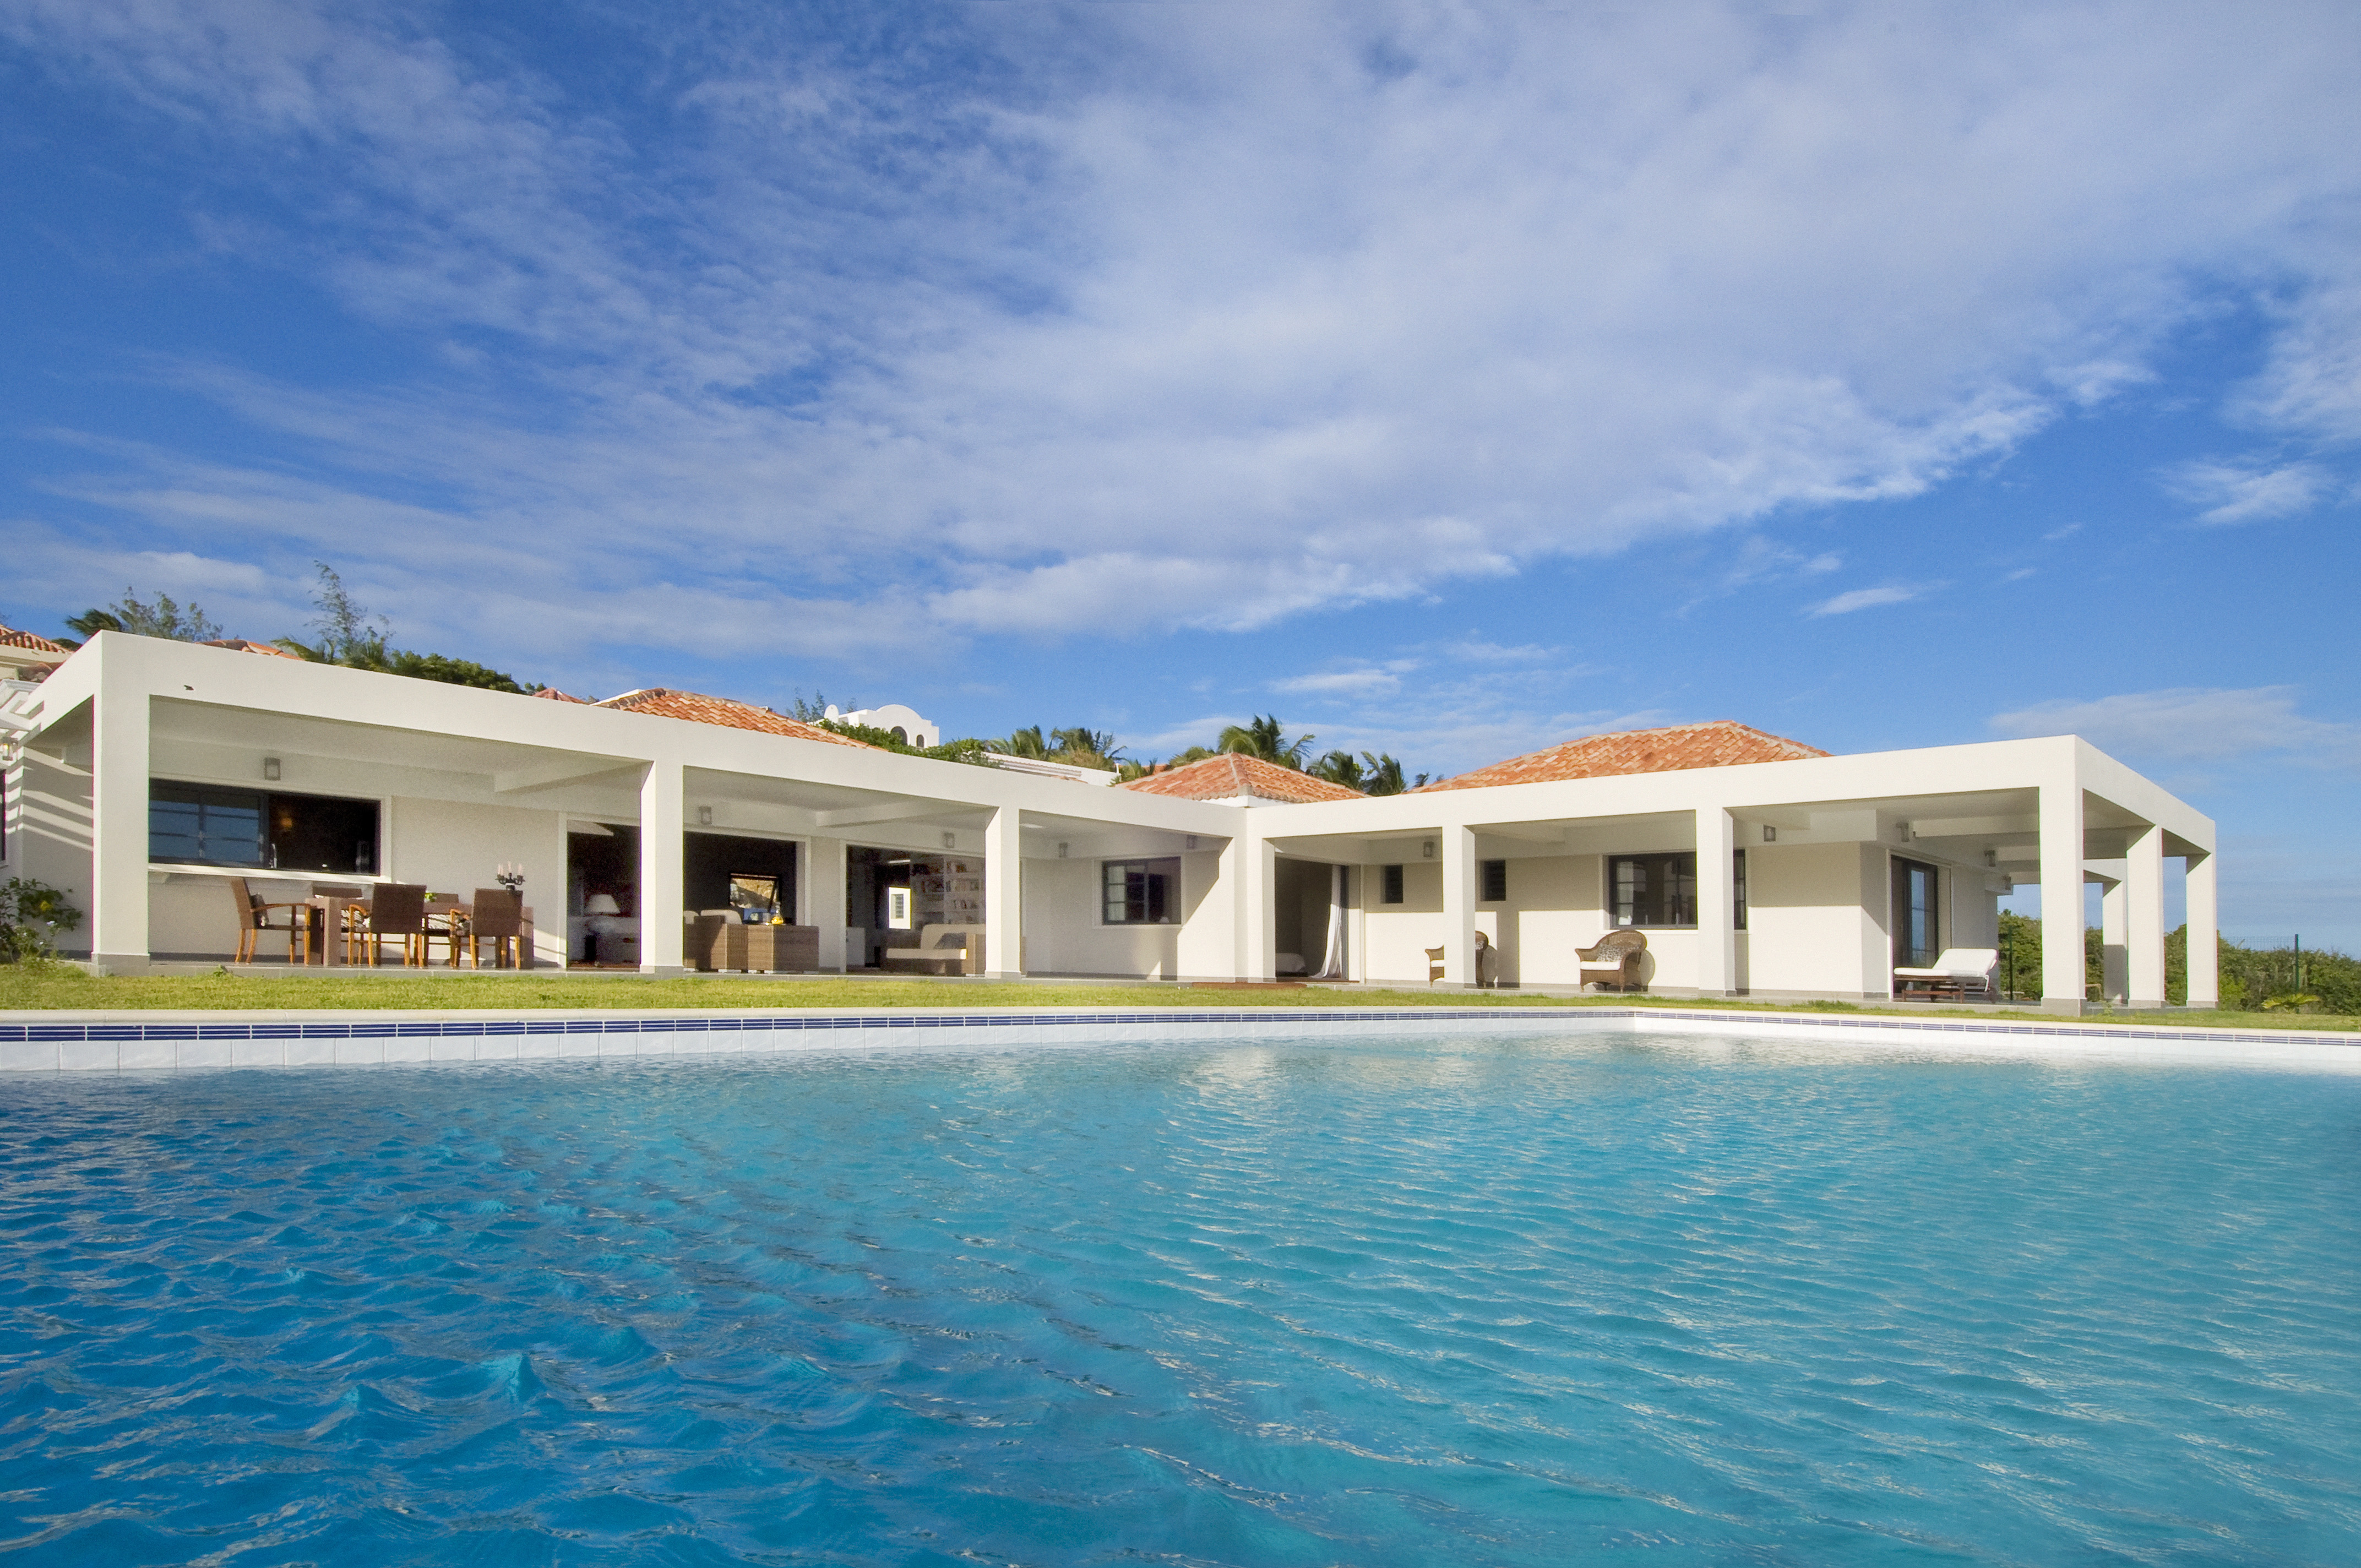 SM400 Private Swimming Pool